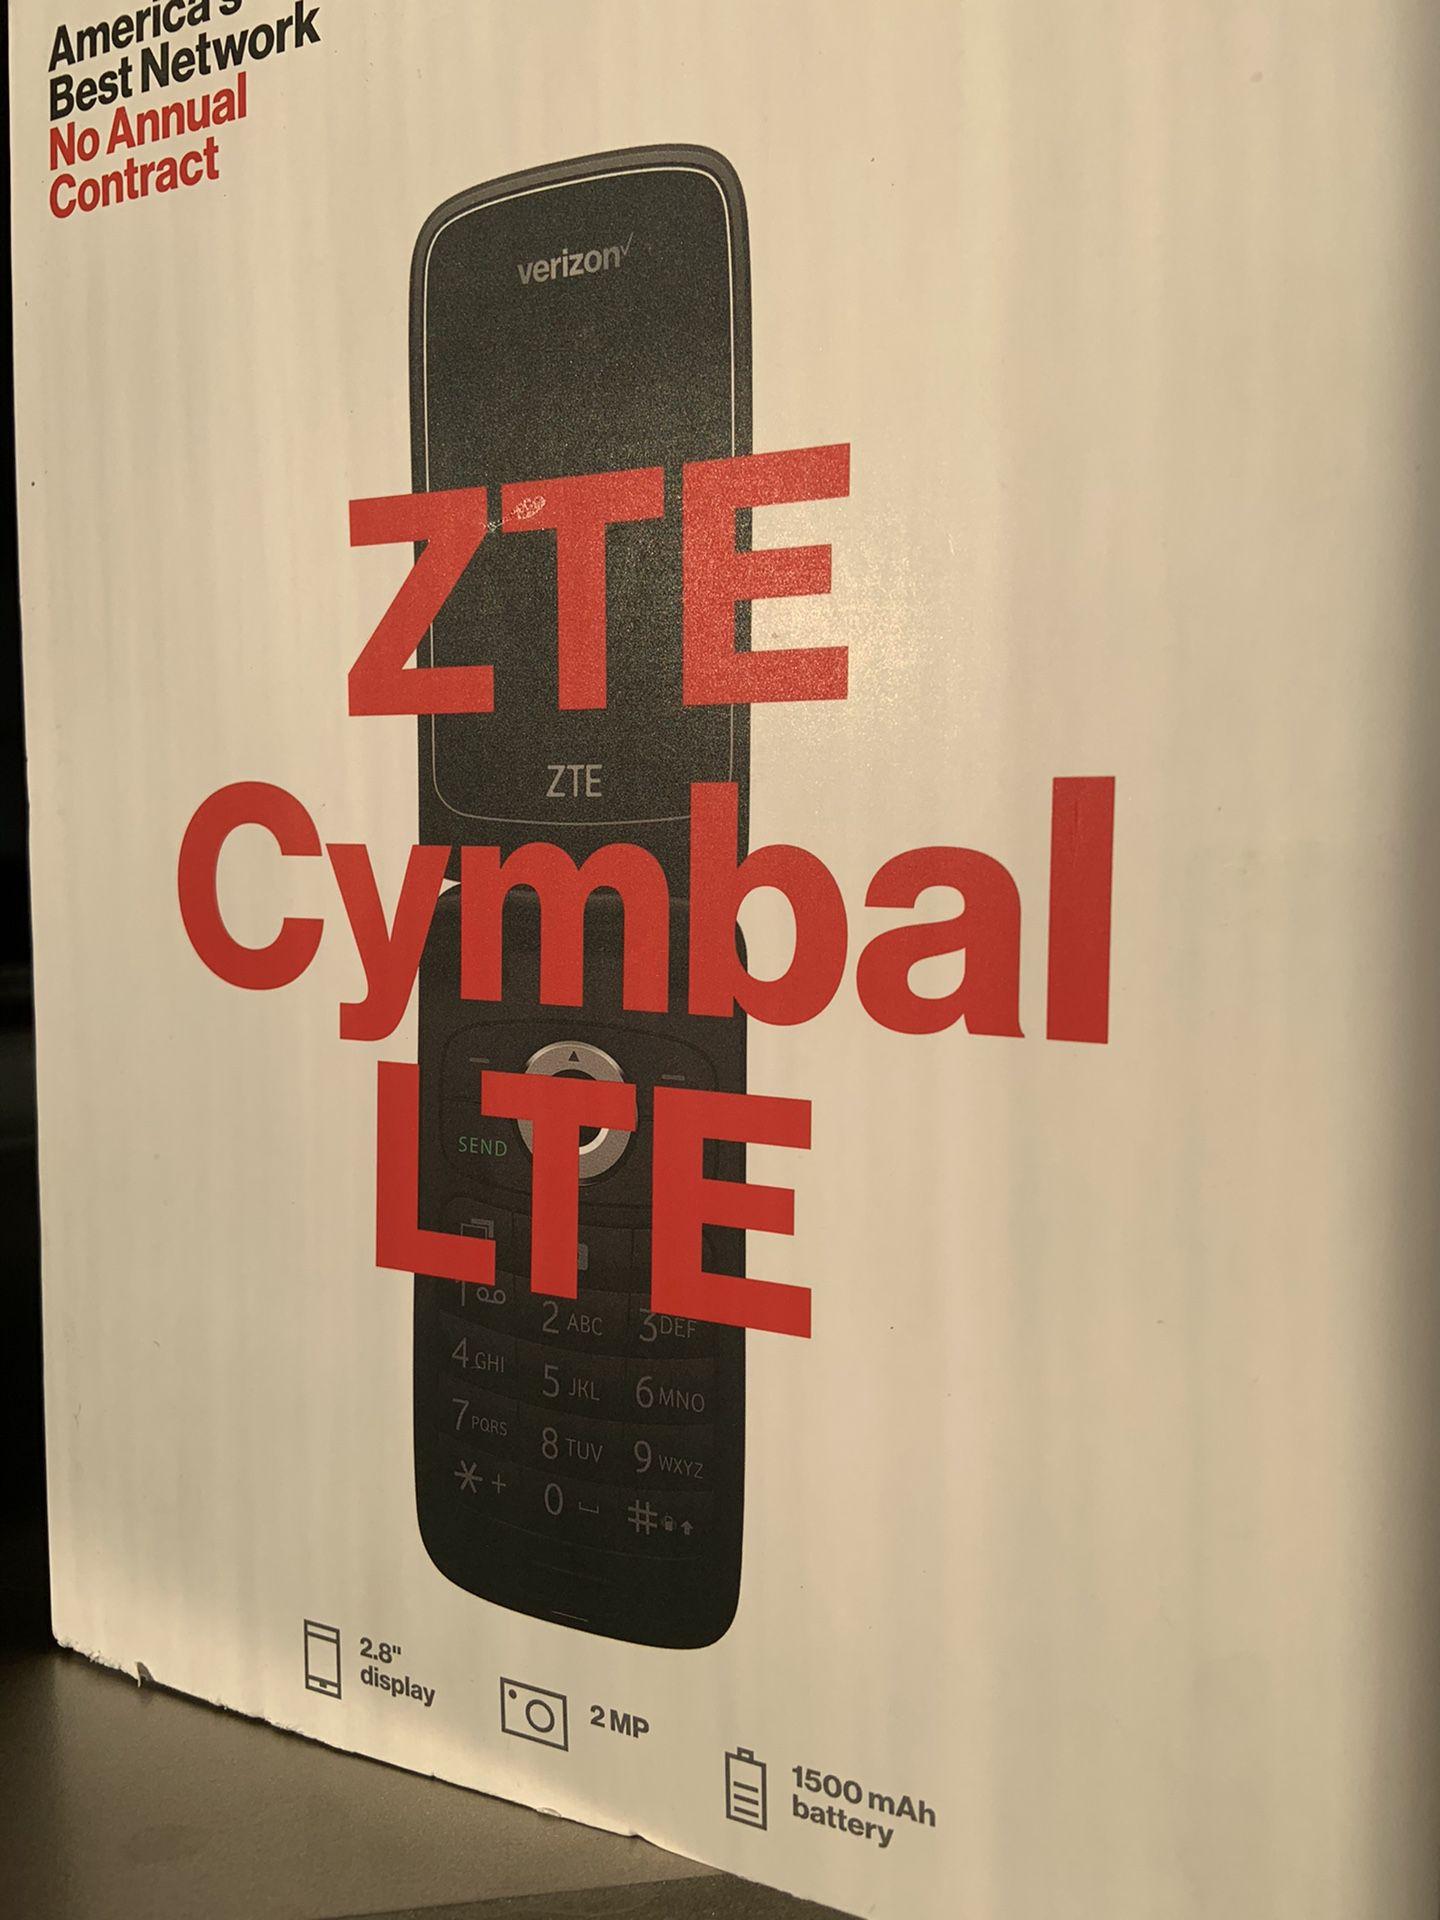 Verizon zte cymbal lte phone